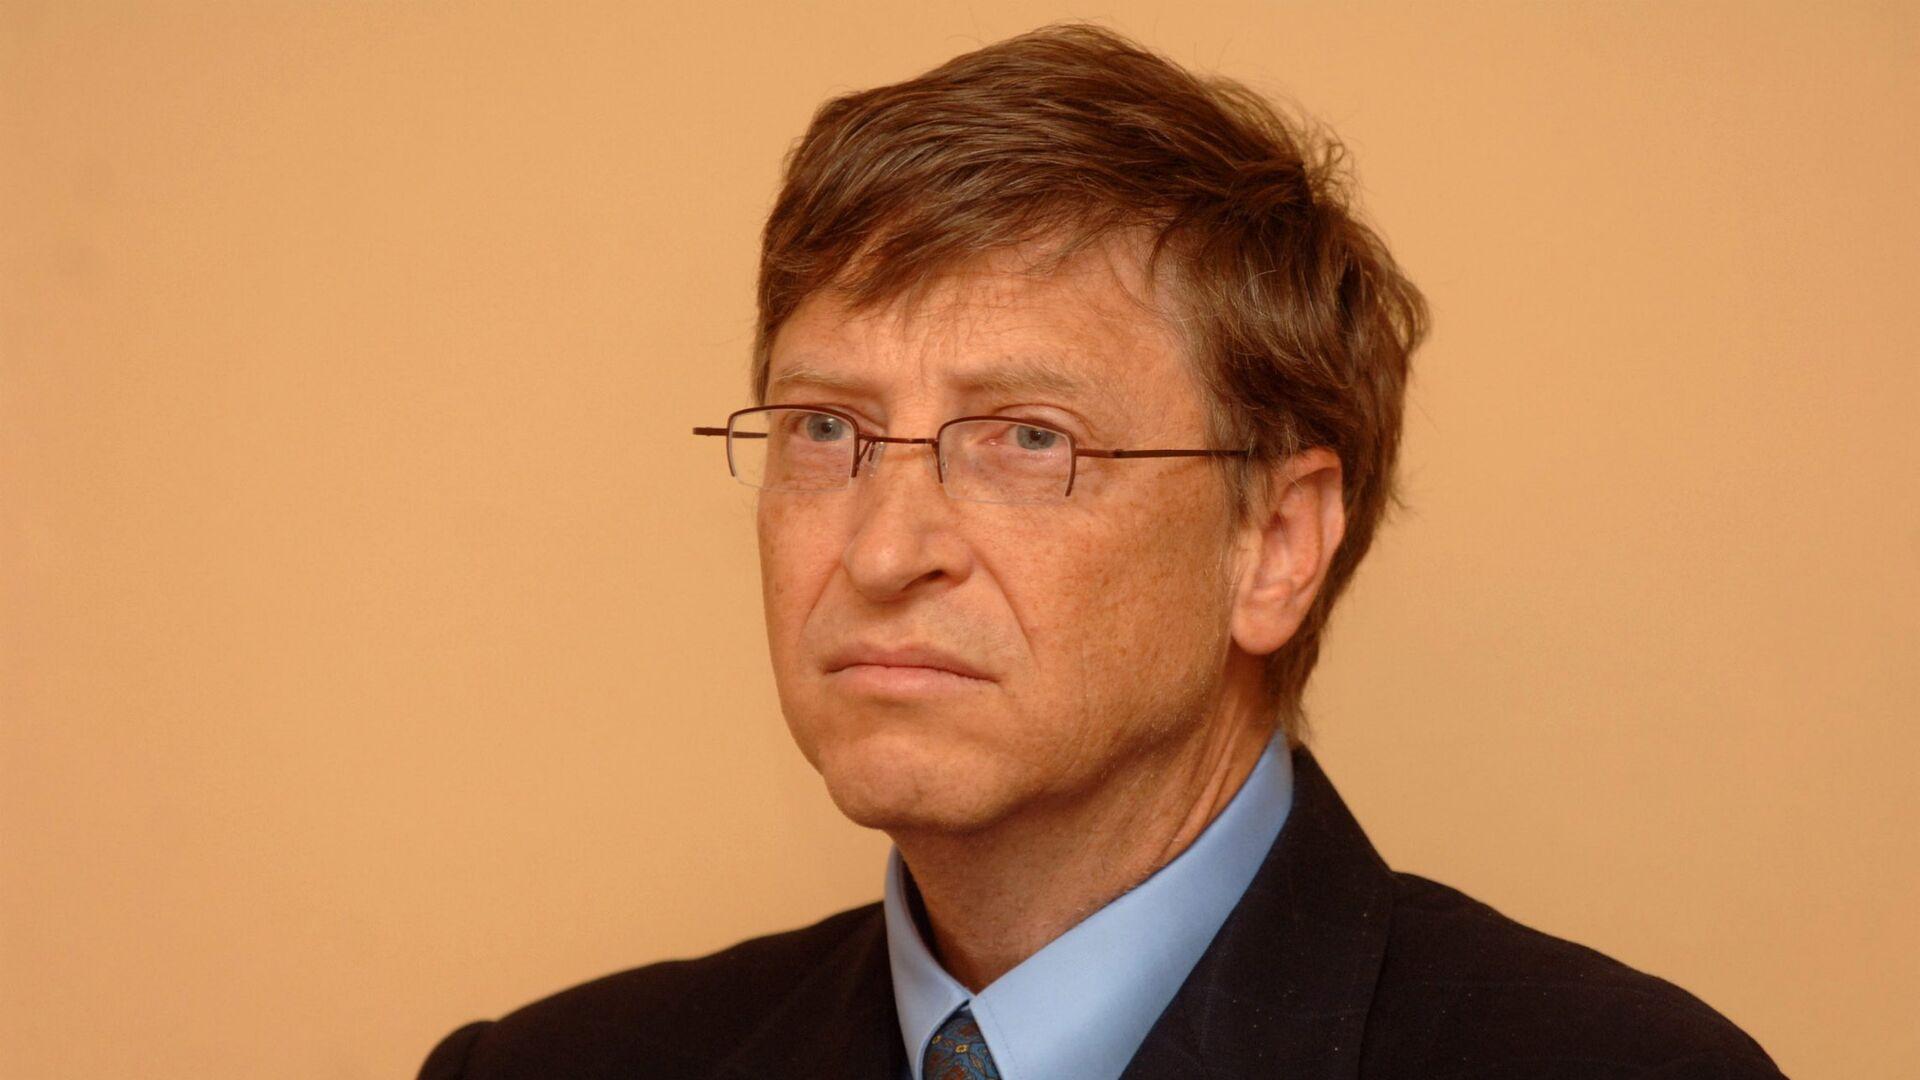 Б.Гейтс во время визита в Москву - РИА Новости, 1920, 20.08.2020